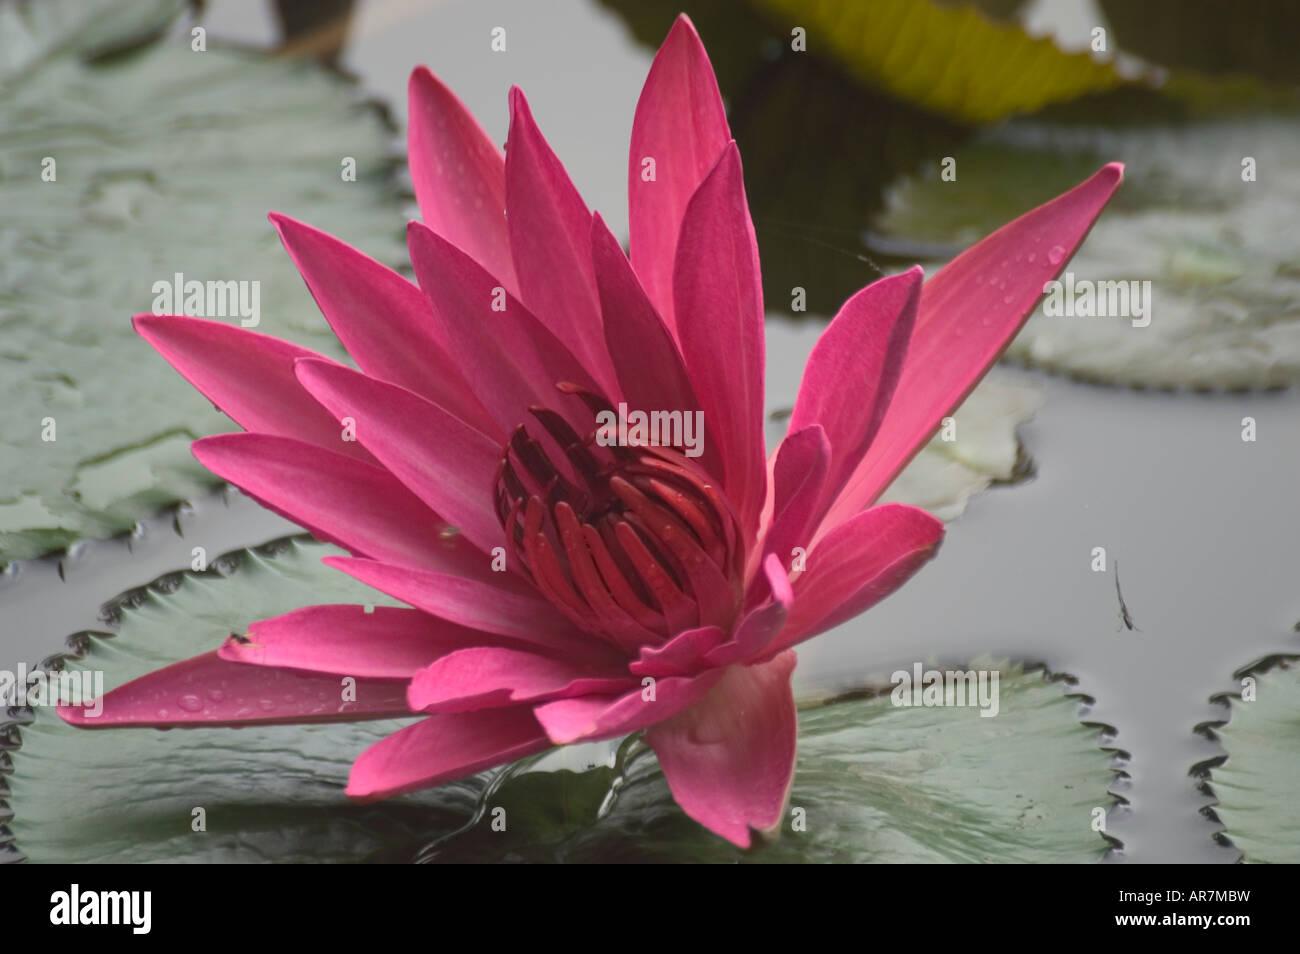 Beautiful lotus flowers stock photos beautiful lotus flowers stock pink nymphaea water lily blooming in late november luang prabang laos stock image izmirmasajfo Images